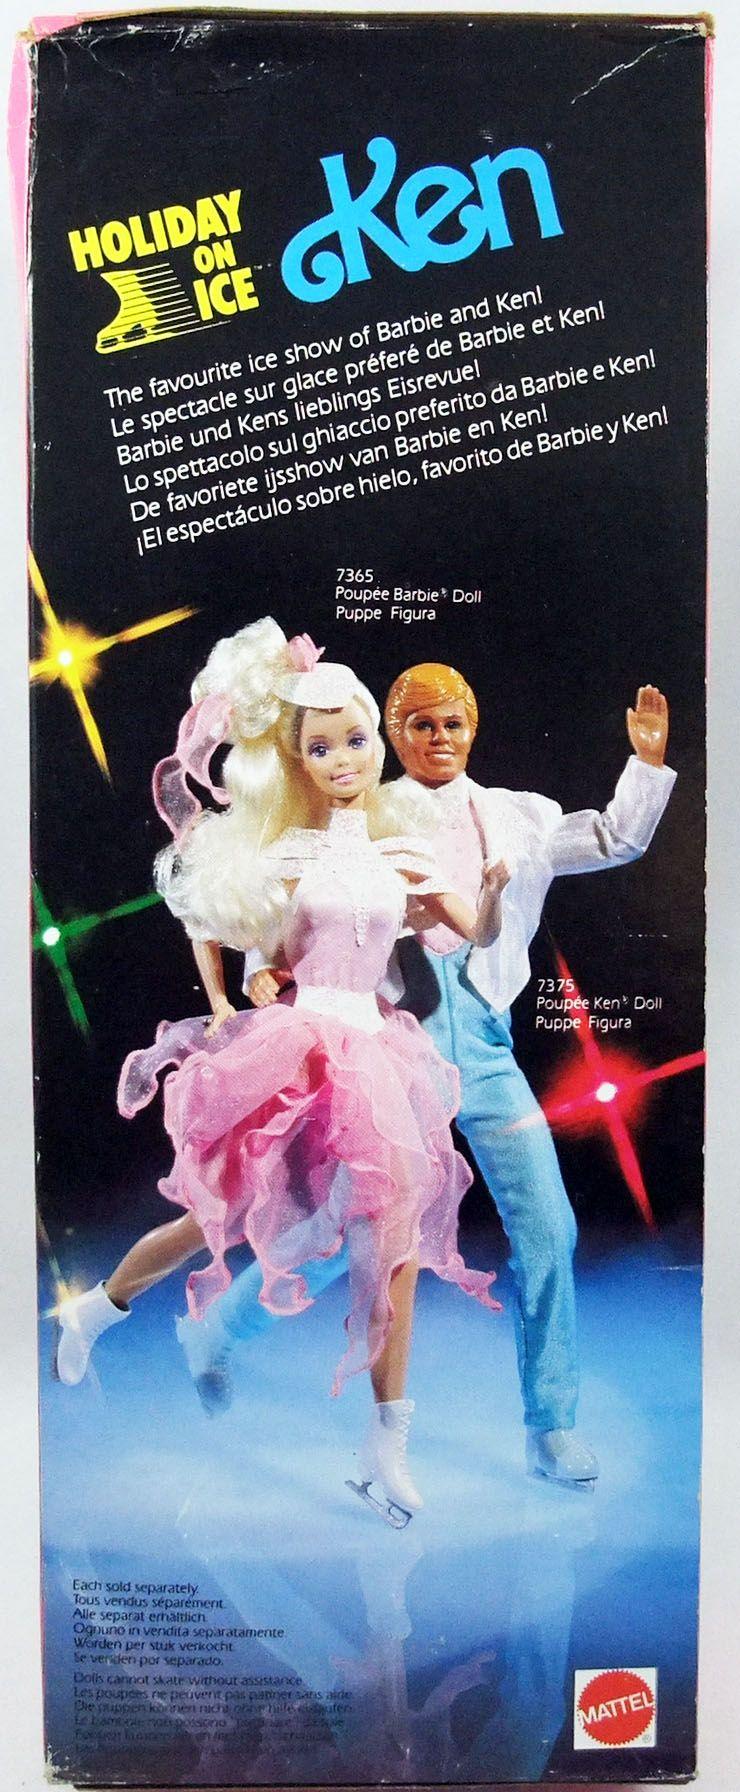 Barbie - Ken Holiday On Ice - Mattel 1989 (ref.7375)